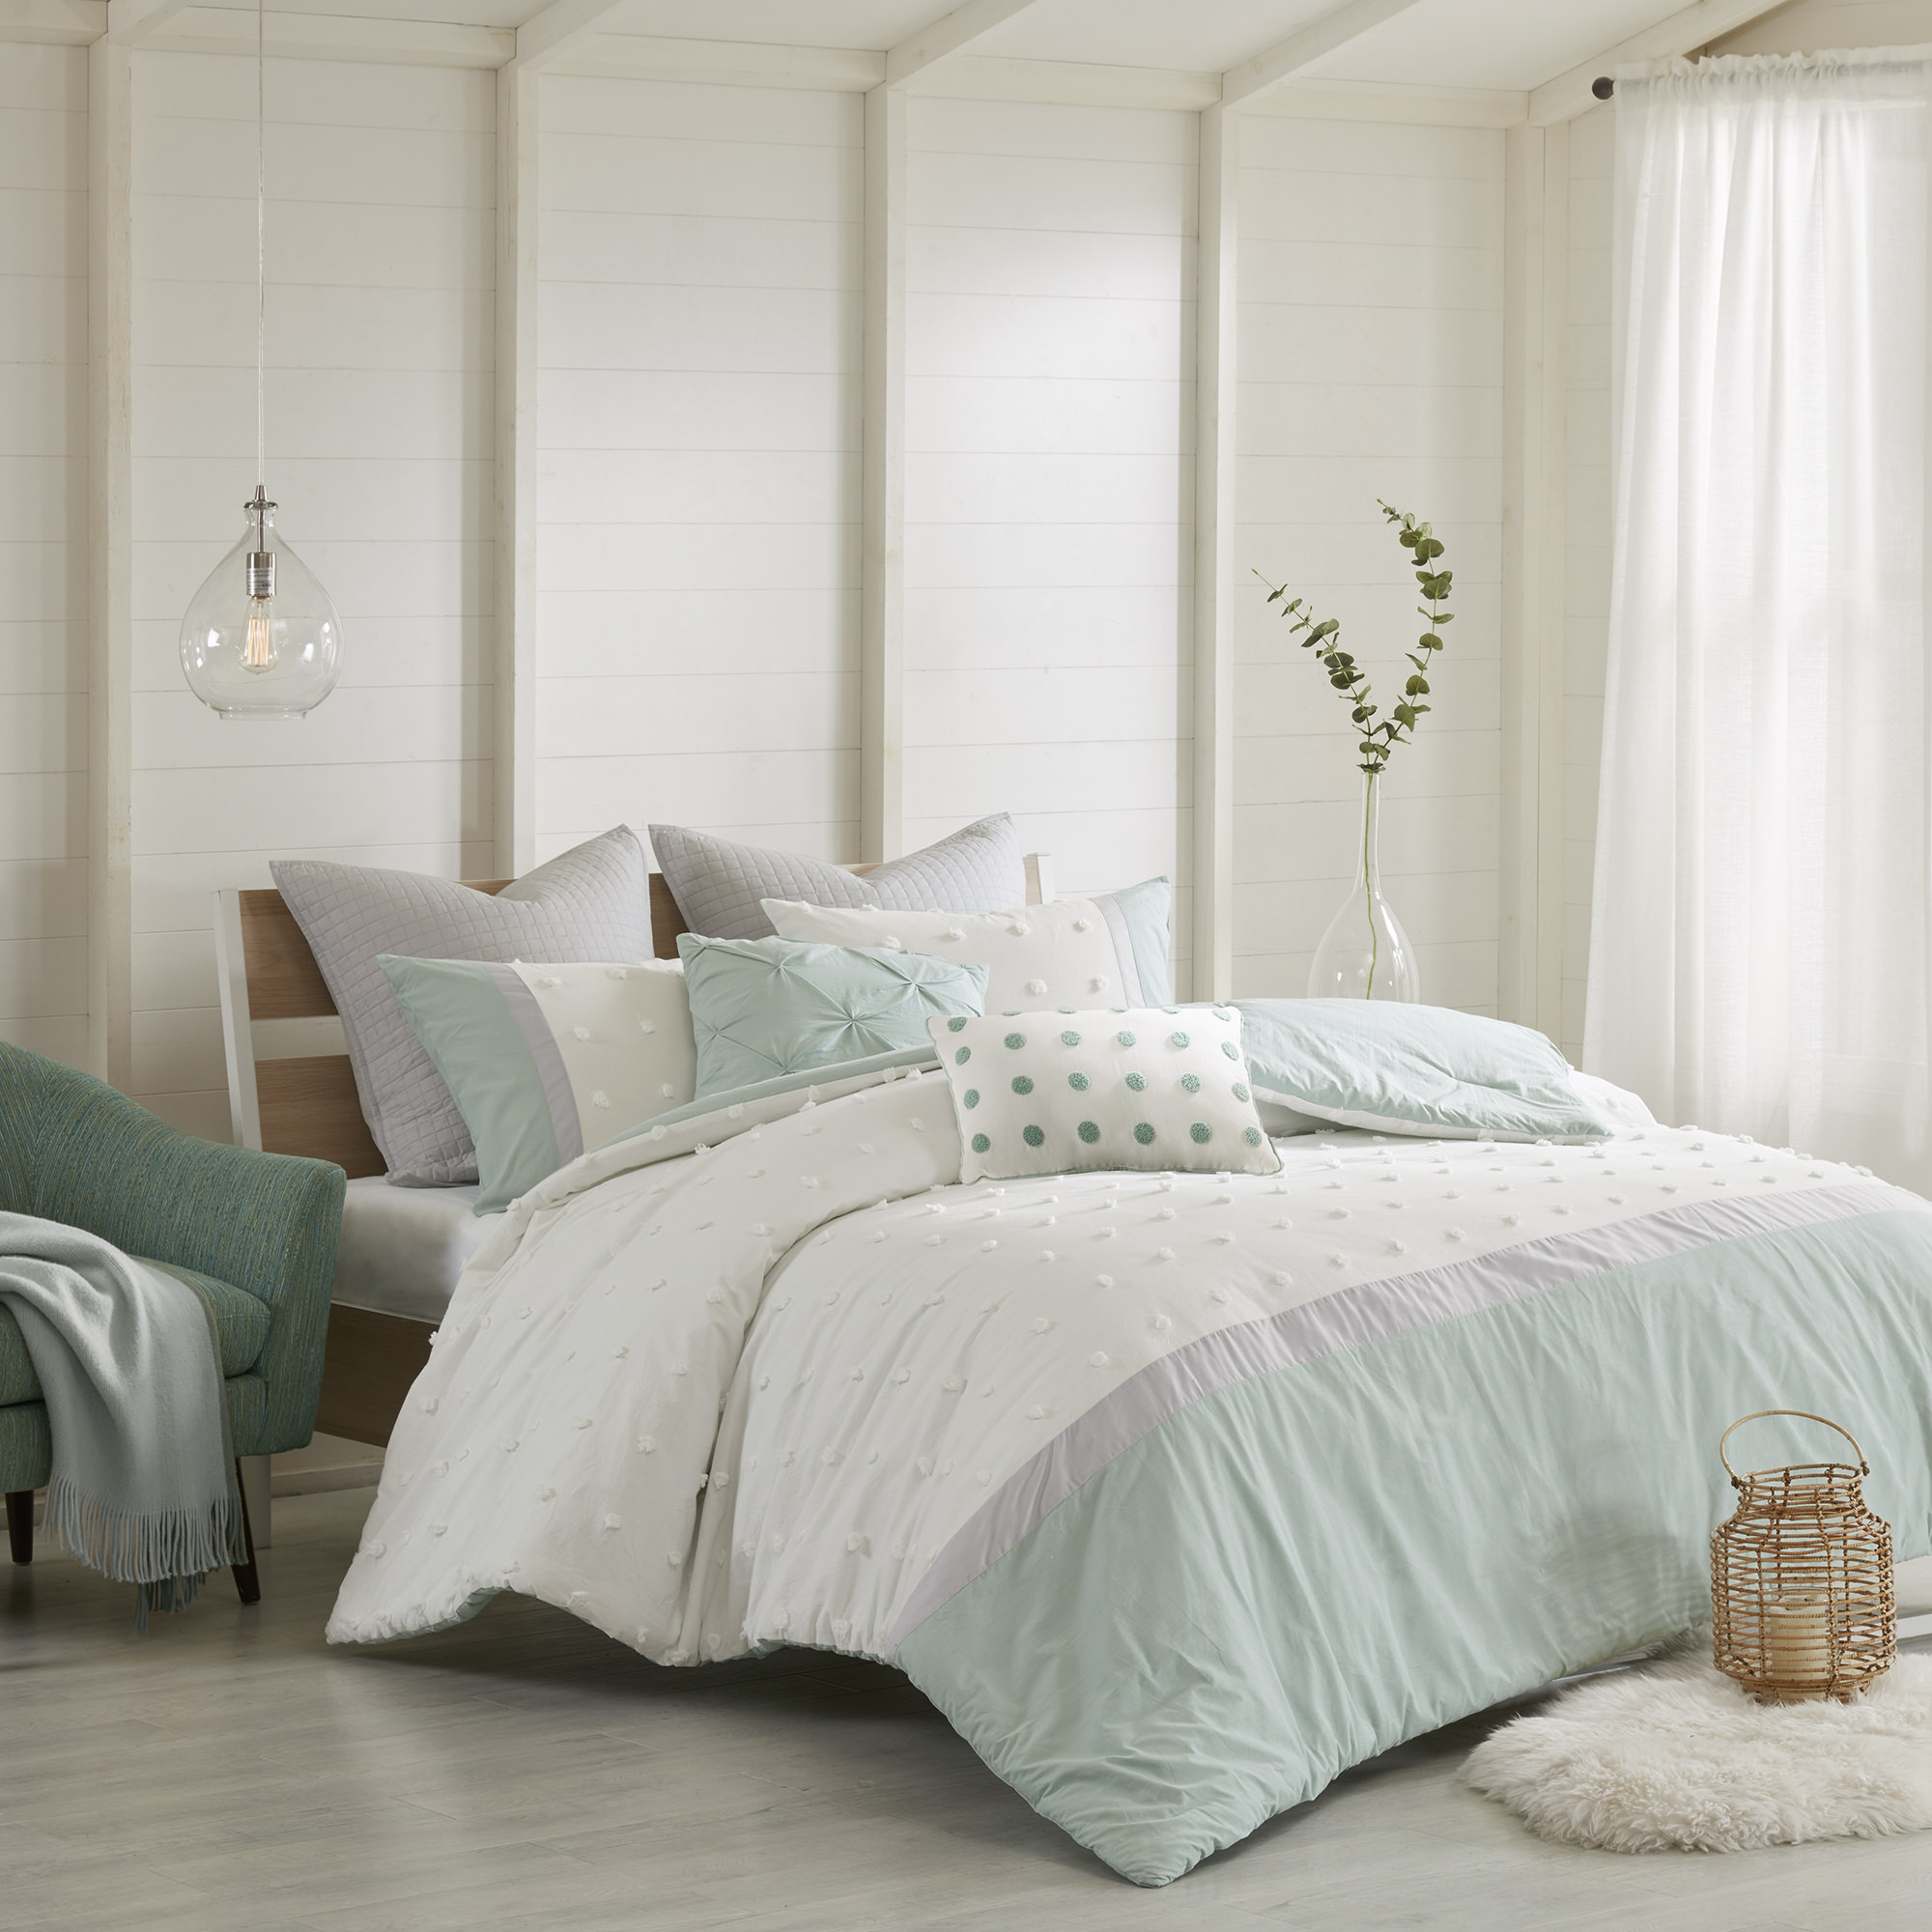 Home Essence Apartment Kira 7 Piece Cotton Jaquard Comforter Set